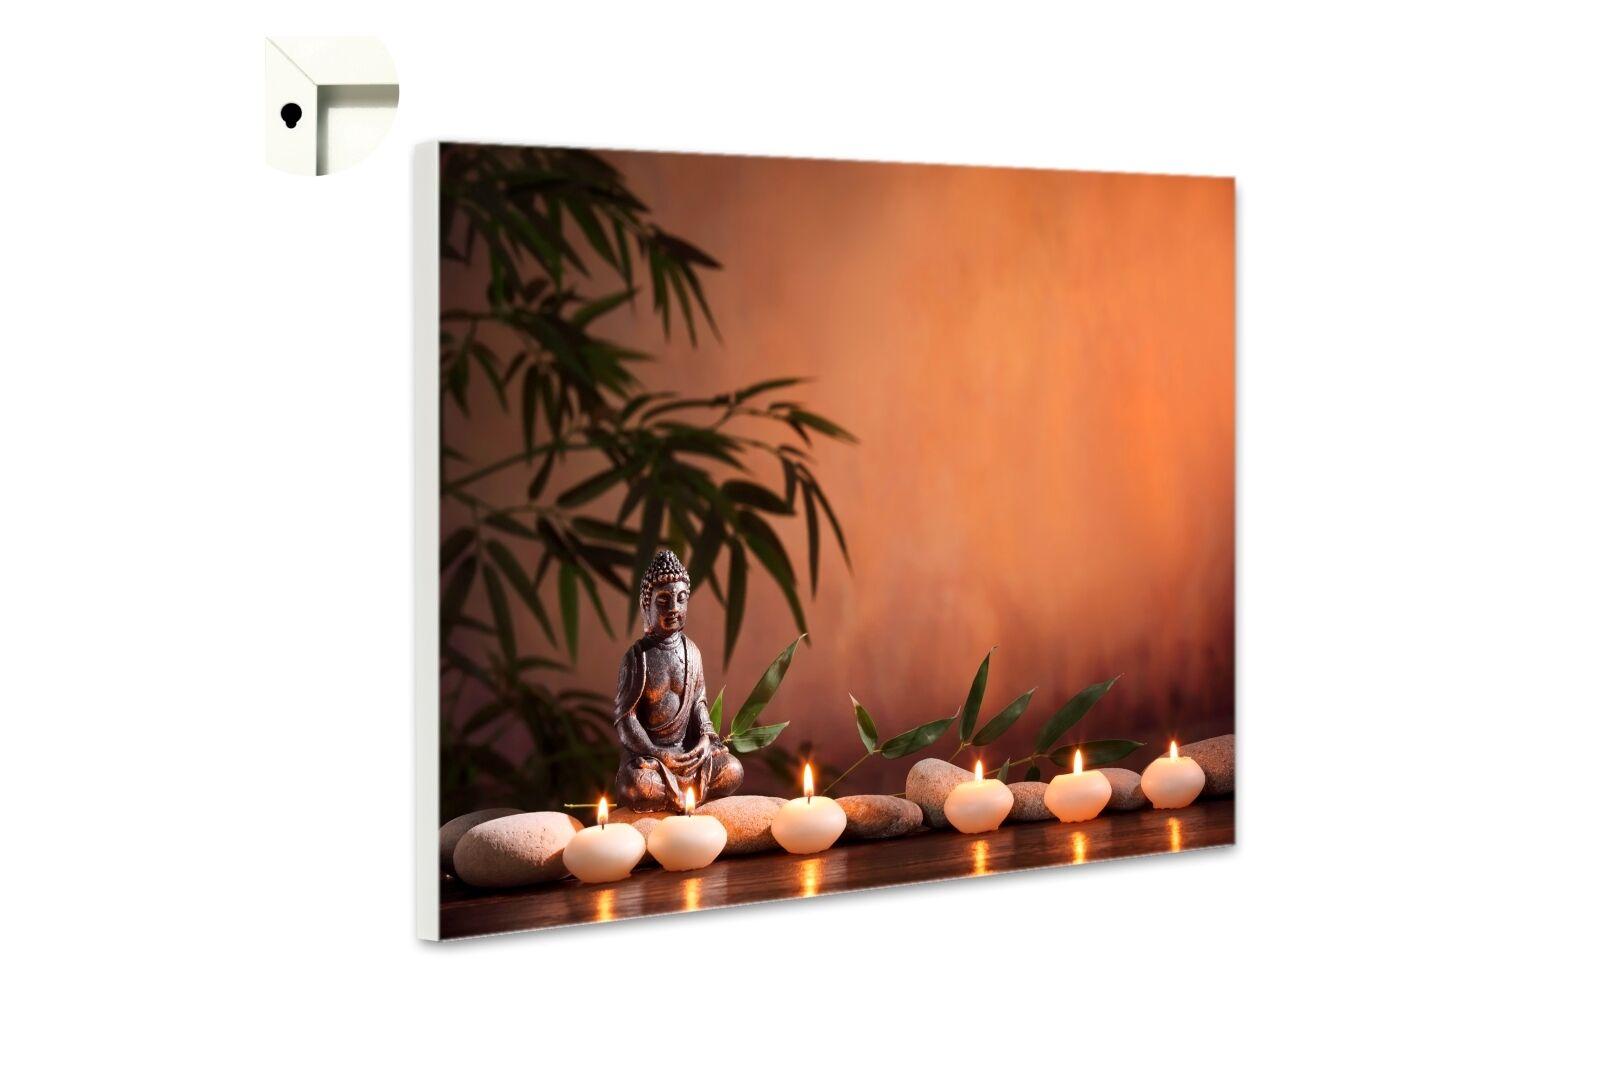 Pinnwand Magnettafel Memoboard Motiv Buddha